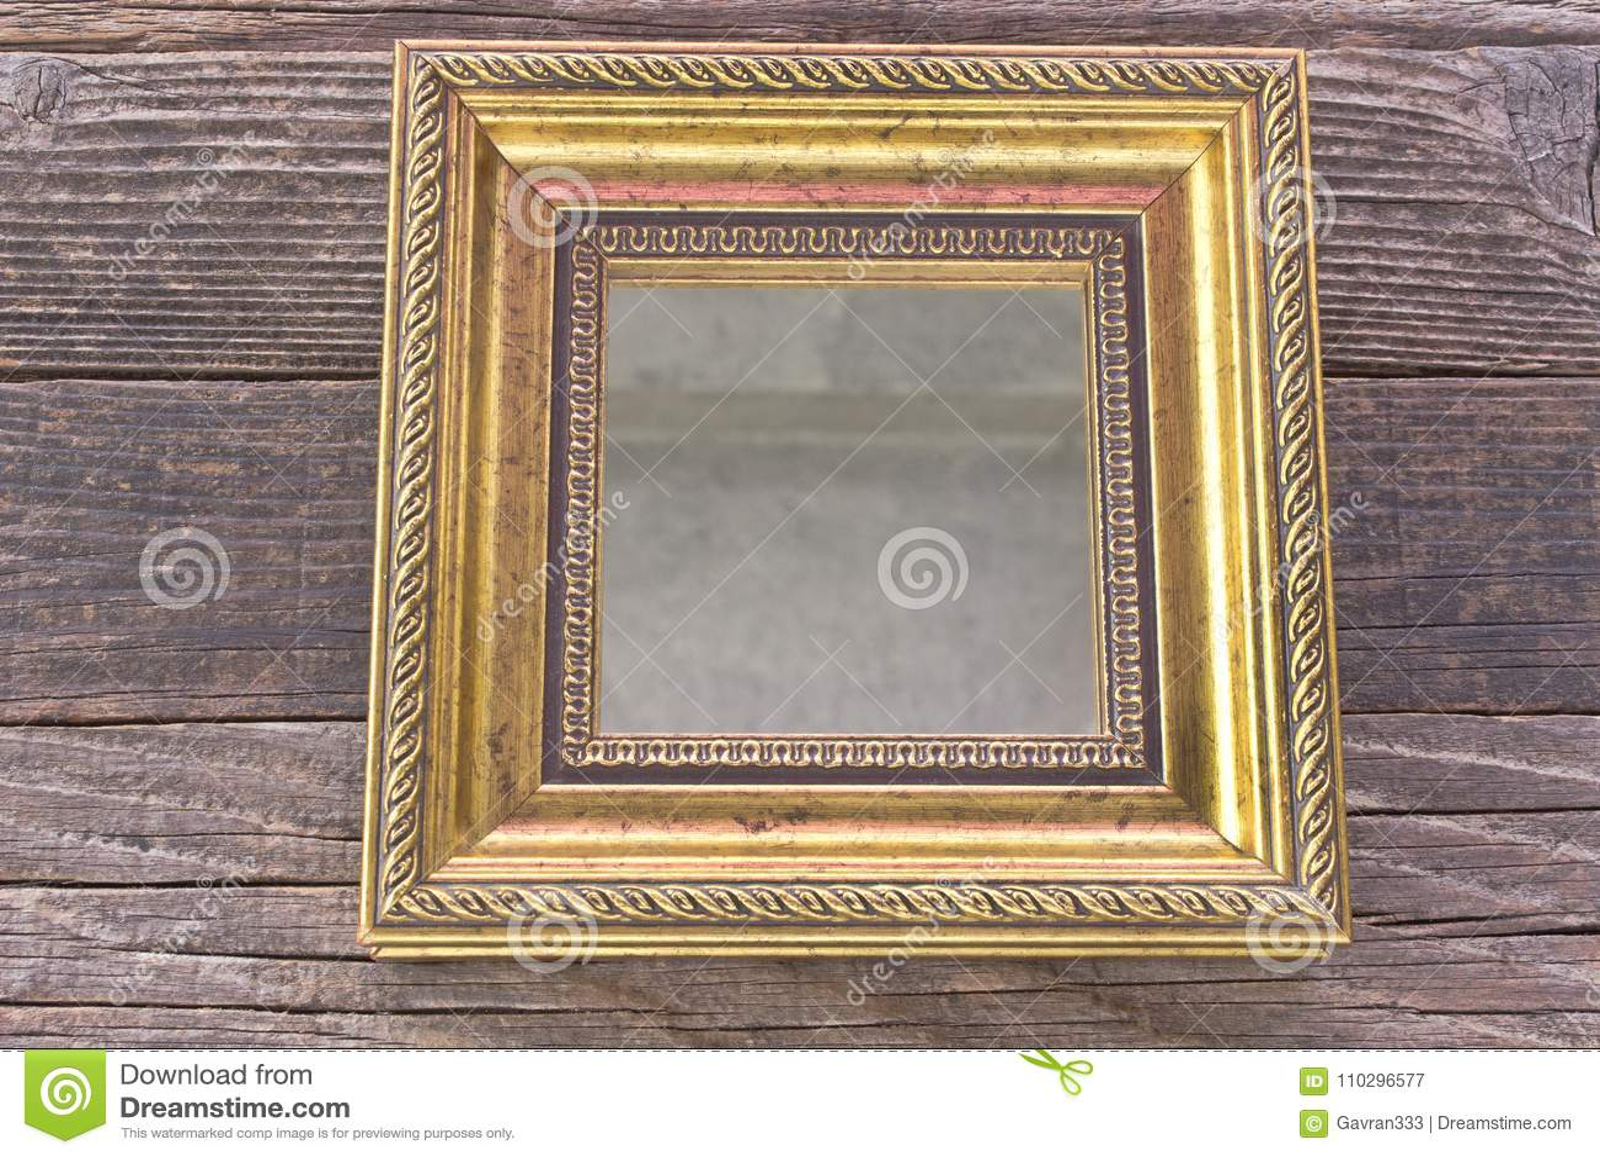 Gouden Barok Spiegel : Gouden spiegel met barok kader op houten achtergrond stock